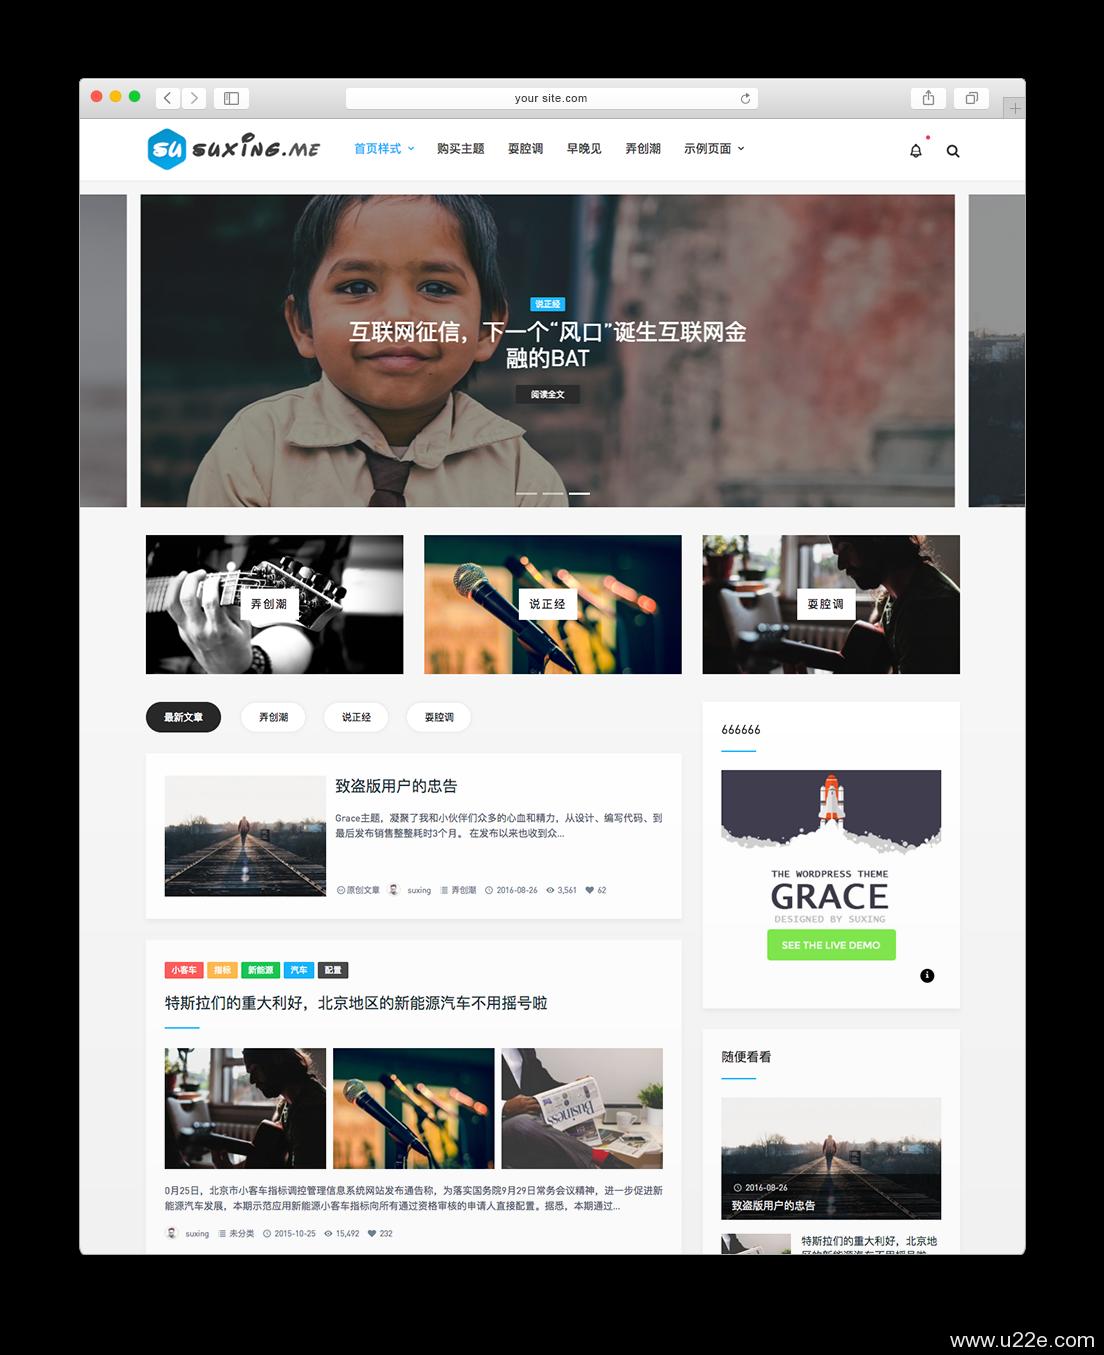 Grace6.2自媒体极客新闻资讯博客类多样化的文章分类样式主题